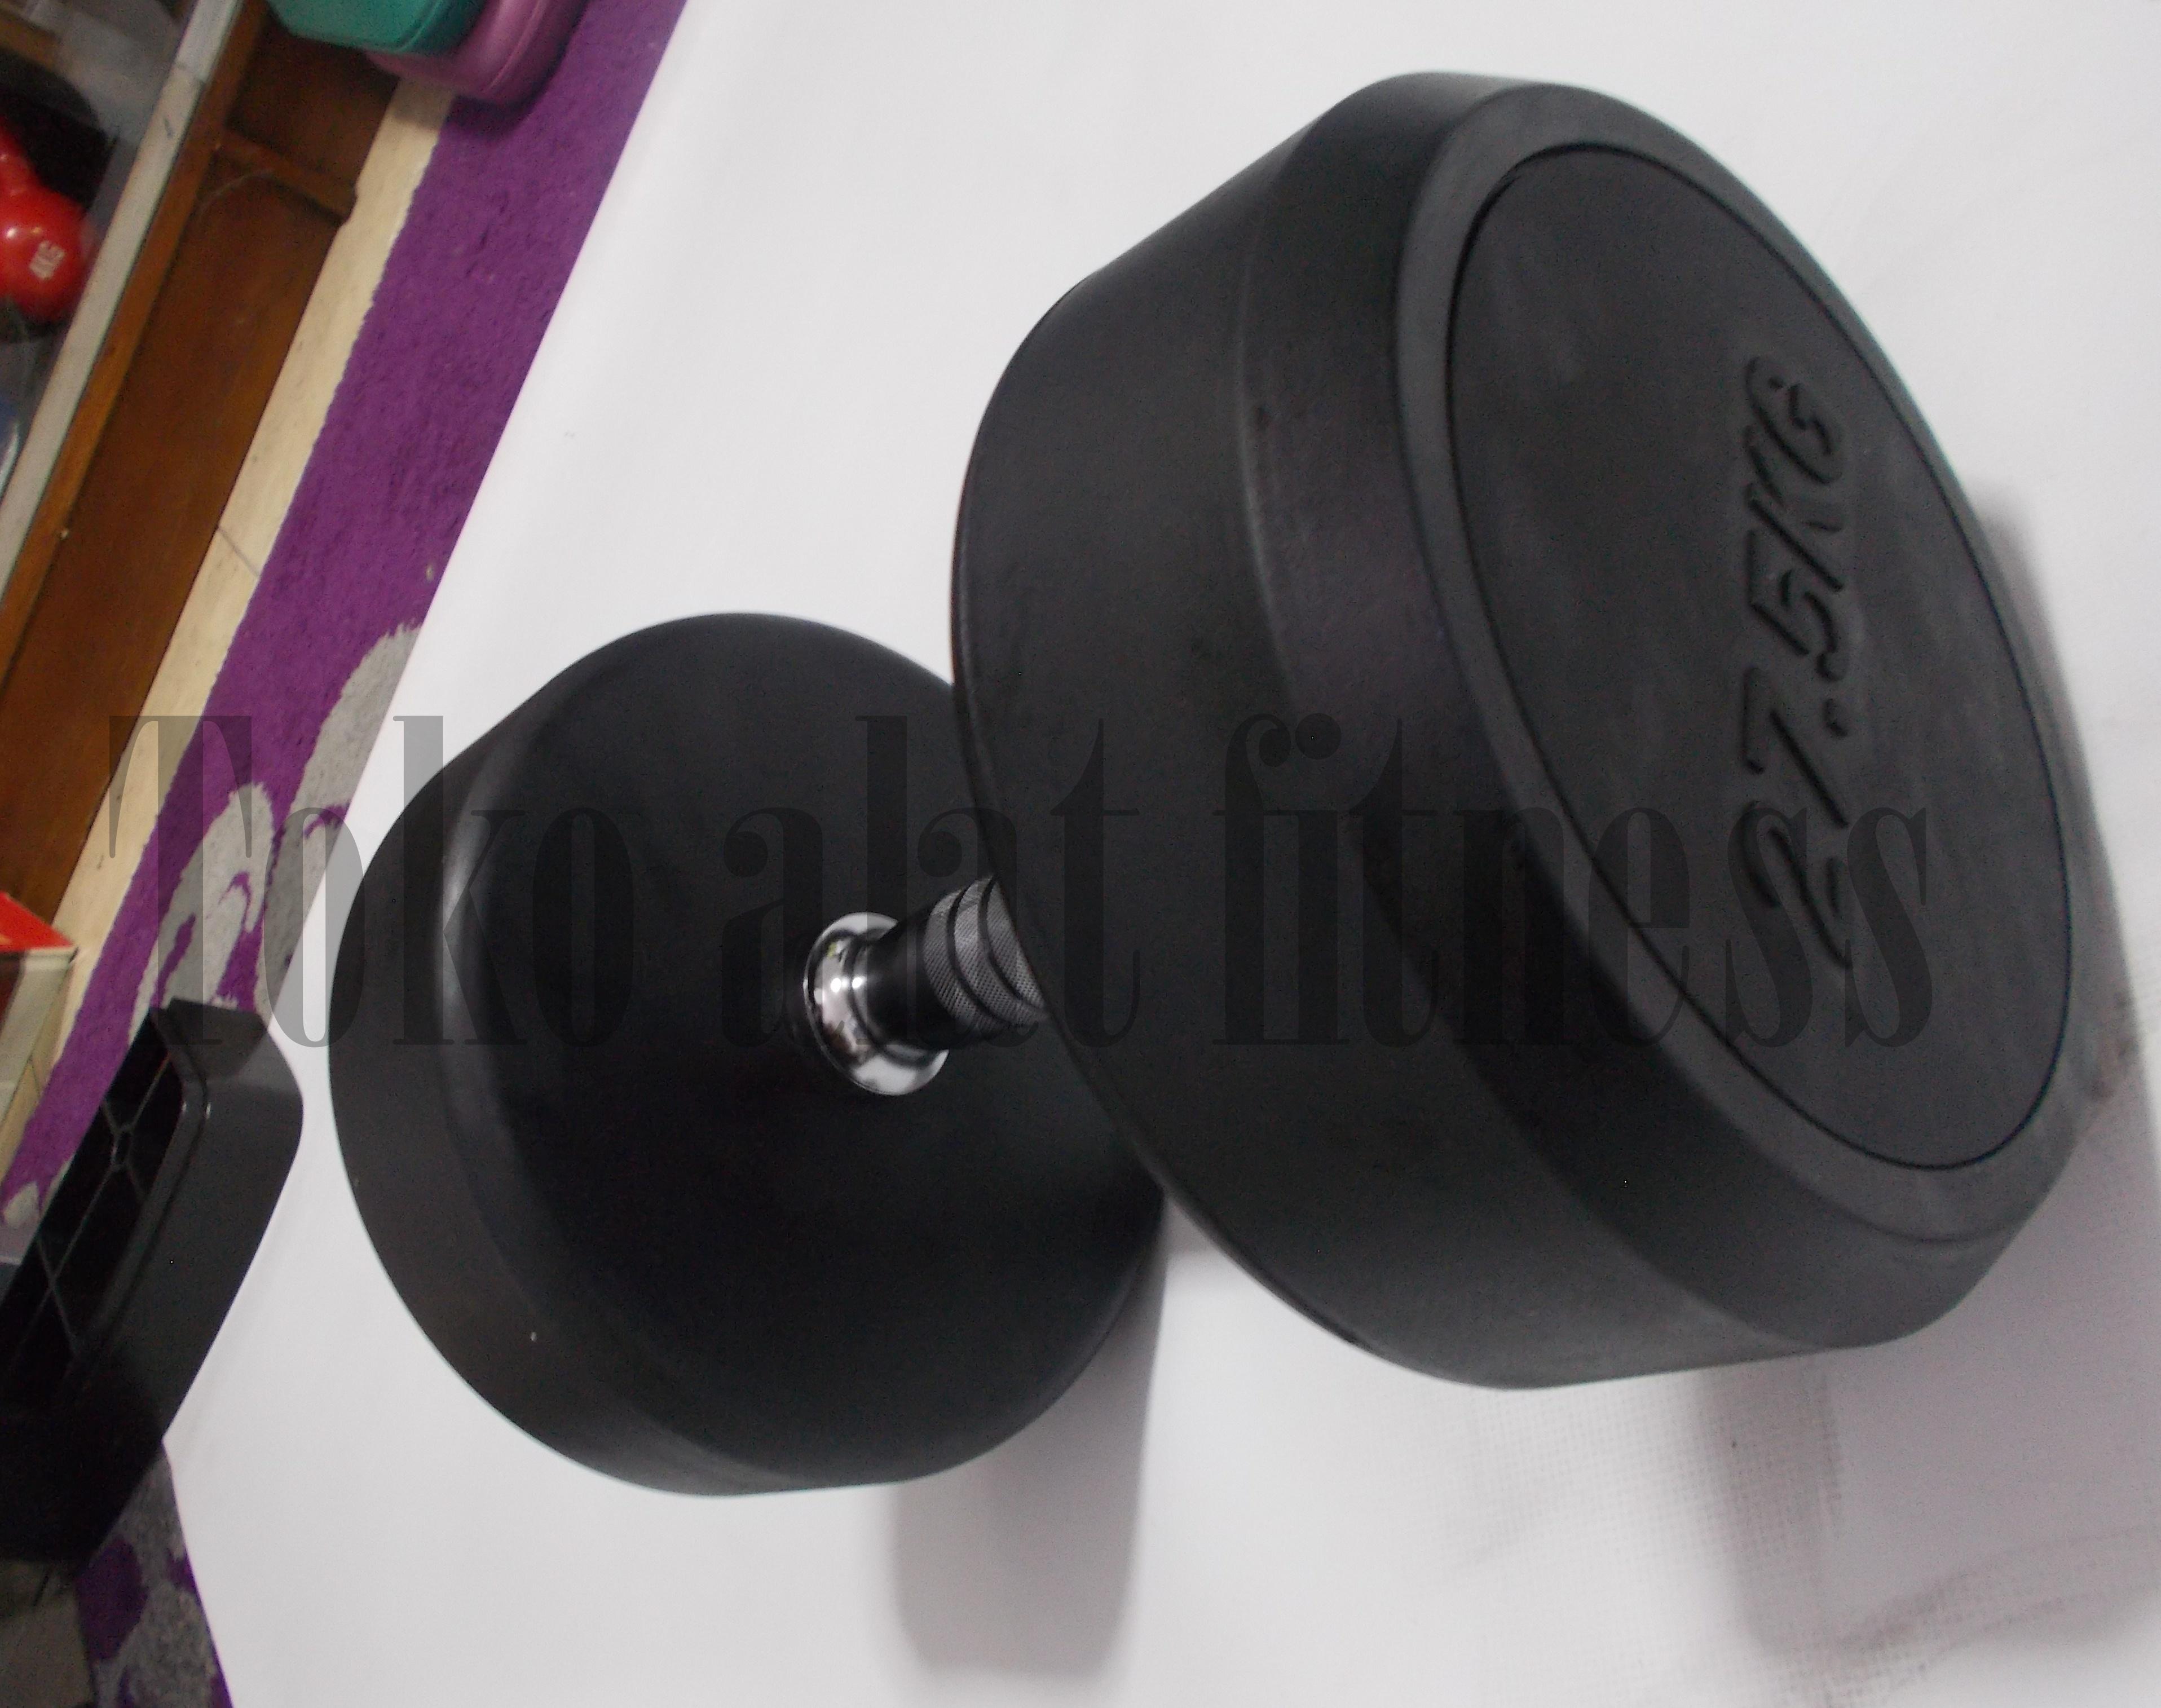 Body Gym Dumbell Fix Rubber 275kg Toko Alat Fitness Baarbeel 5kg Indonesia